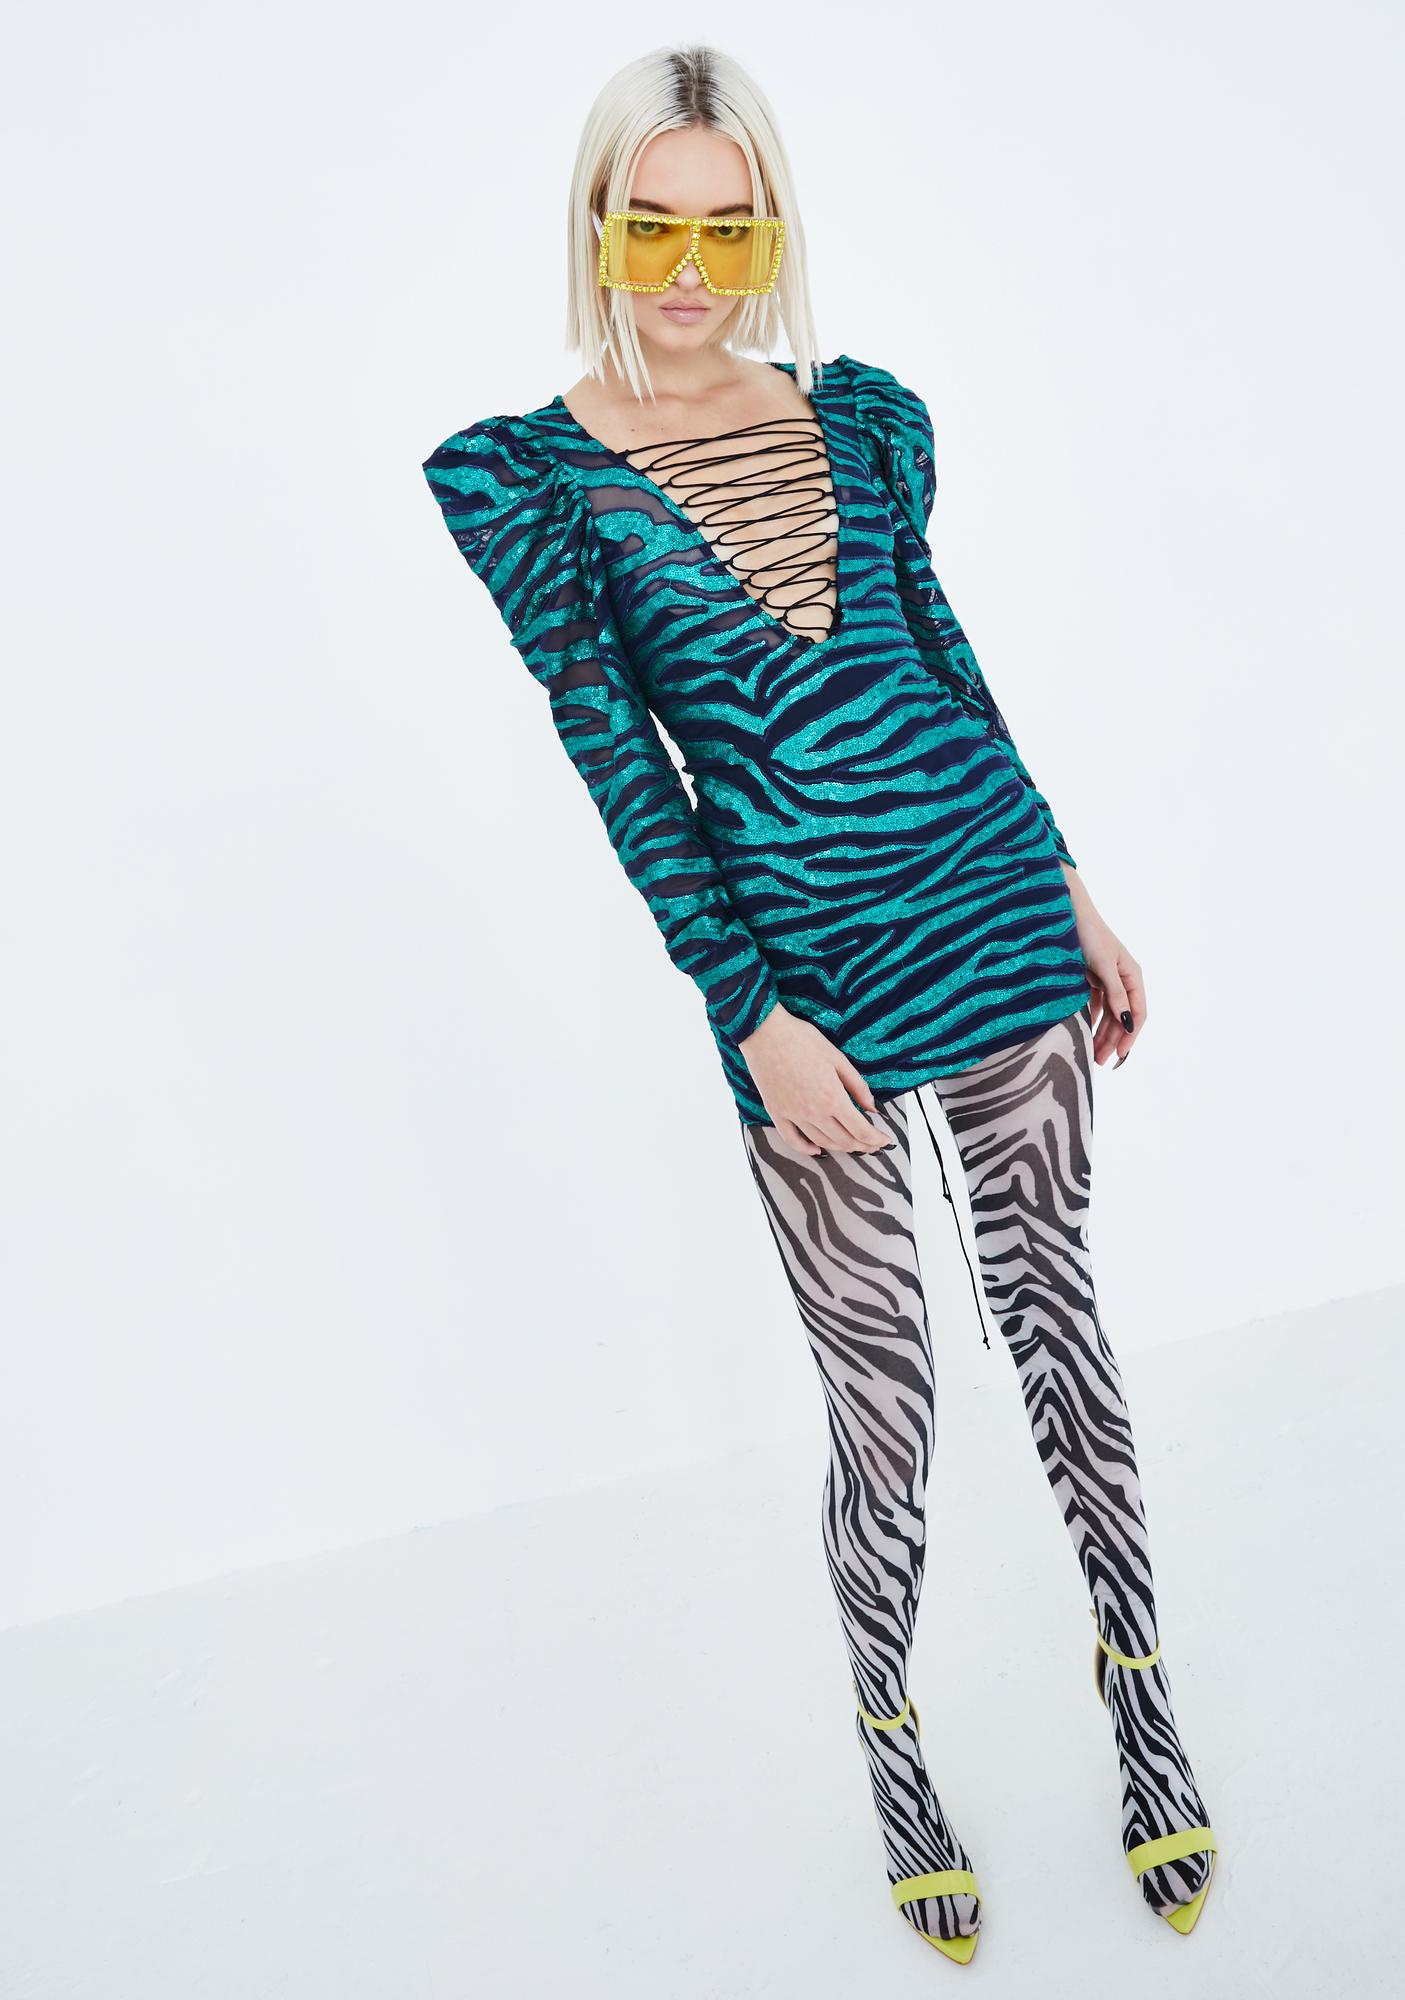 For Love & Lemons Vixen Tiger Sequin Lace-Up Dress